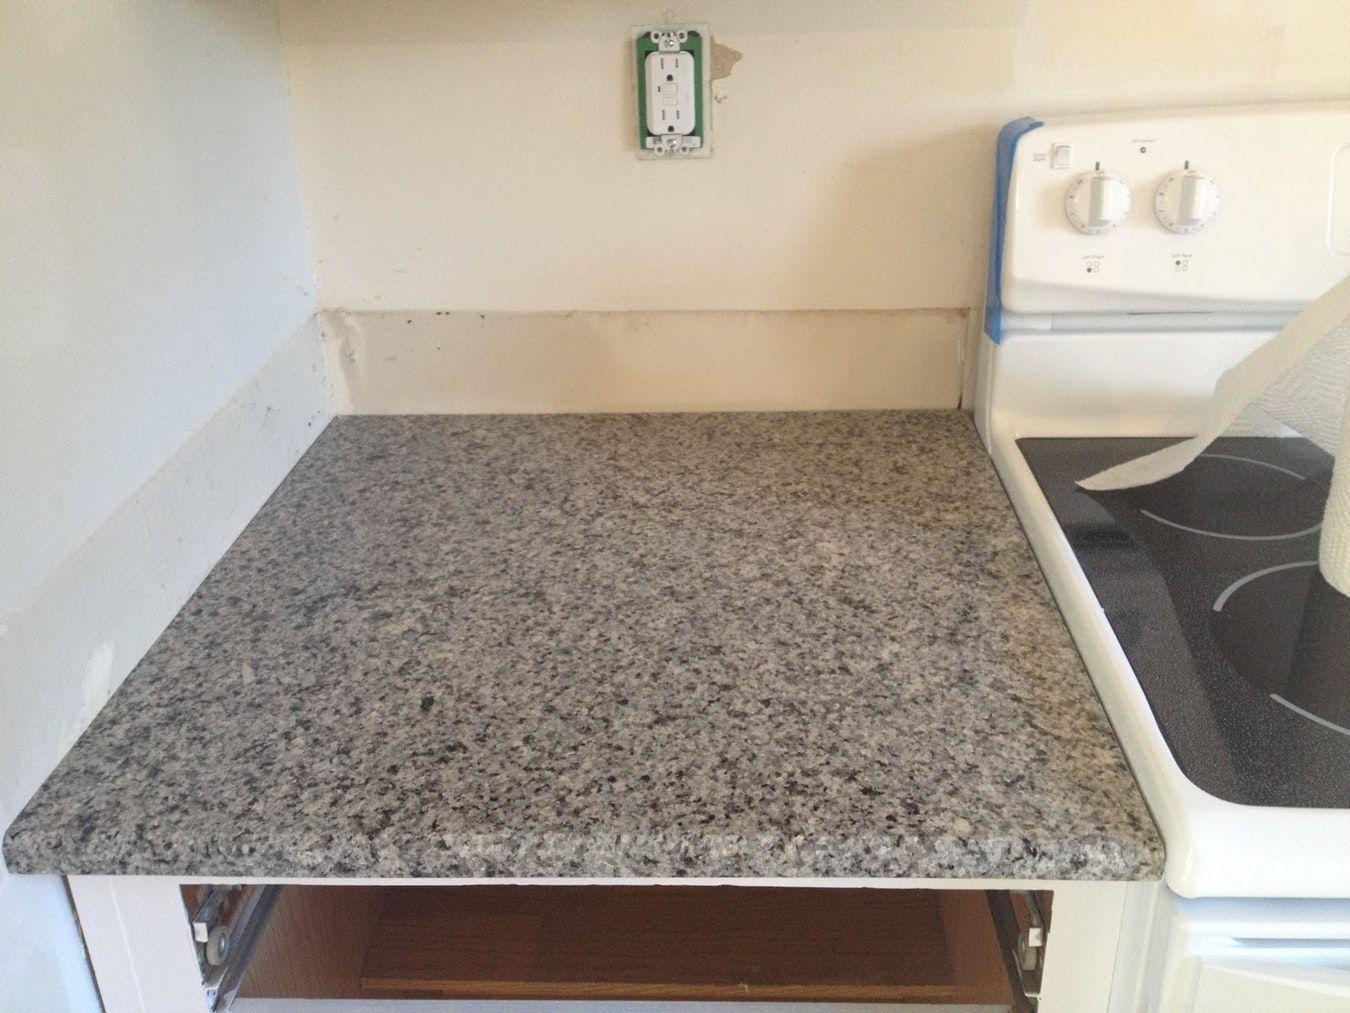 50 Granite Paint For Countertops Home